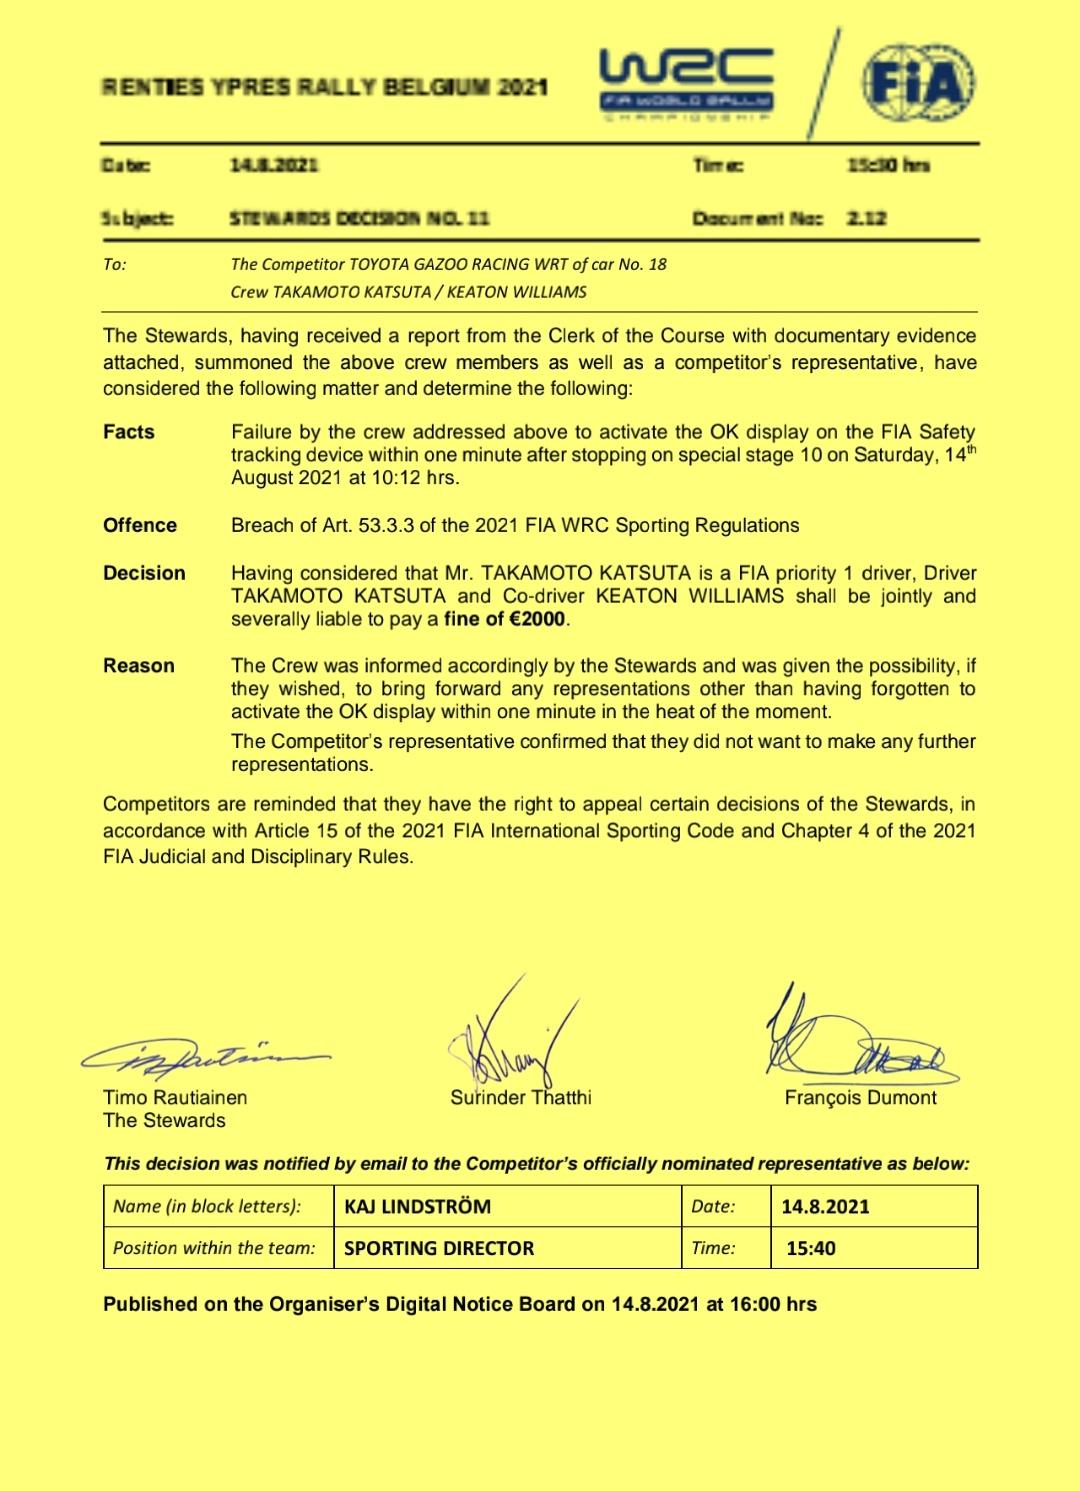 WRC: RENTIES Ypres Rally [13-15 Agosto] - Página 4 E8wddZuX0Agyvdf?format=jpg&name=large